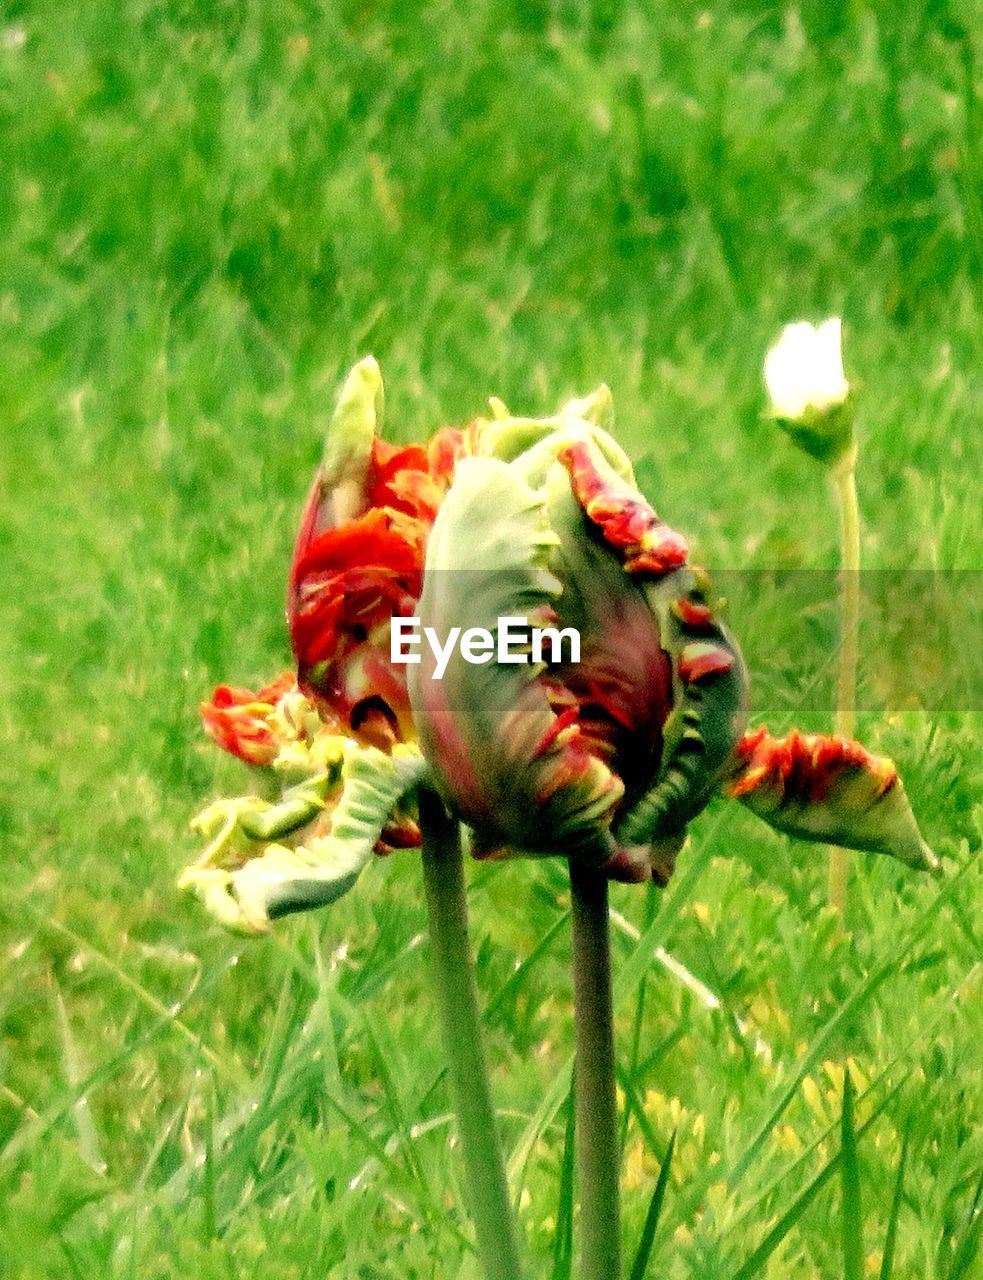 Close up of flower bud